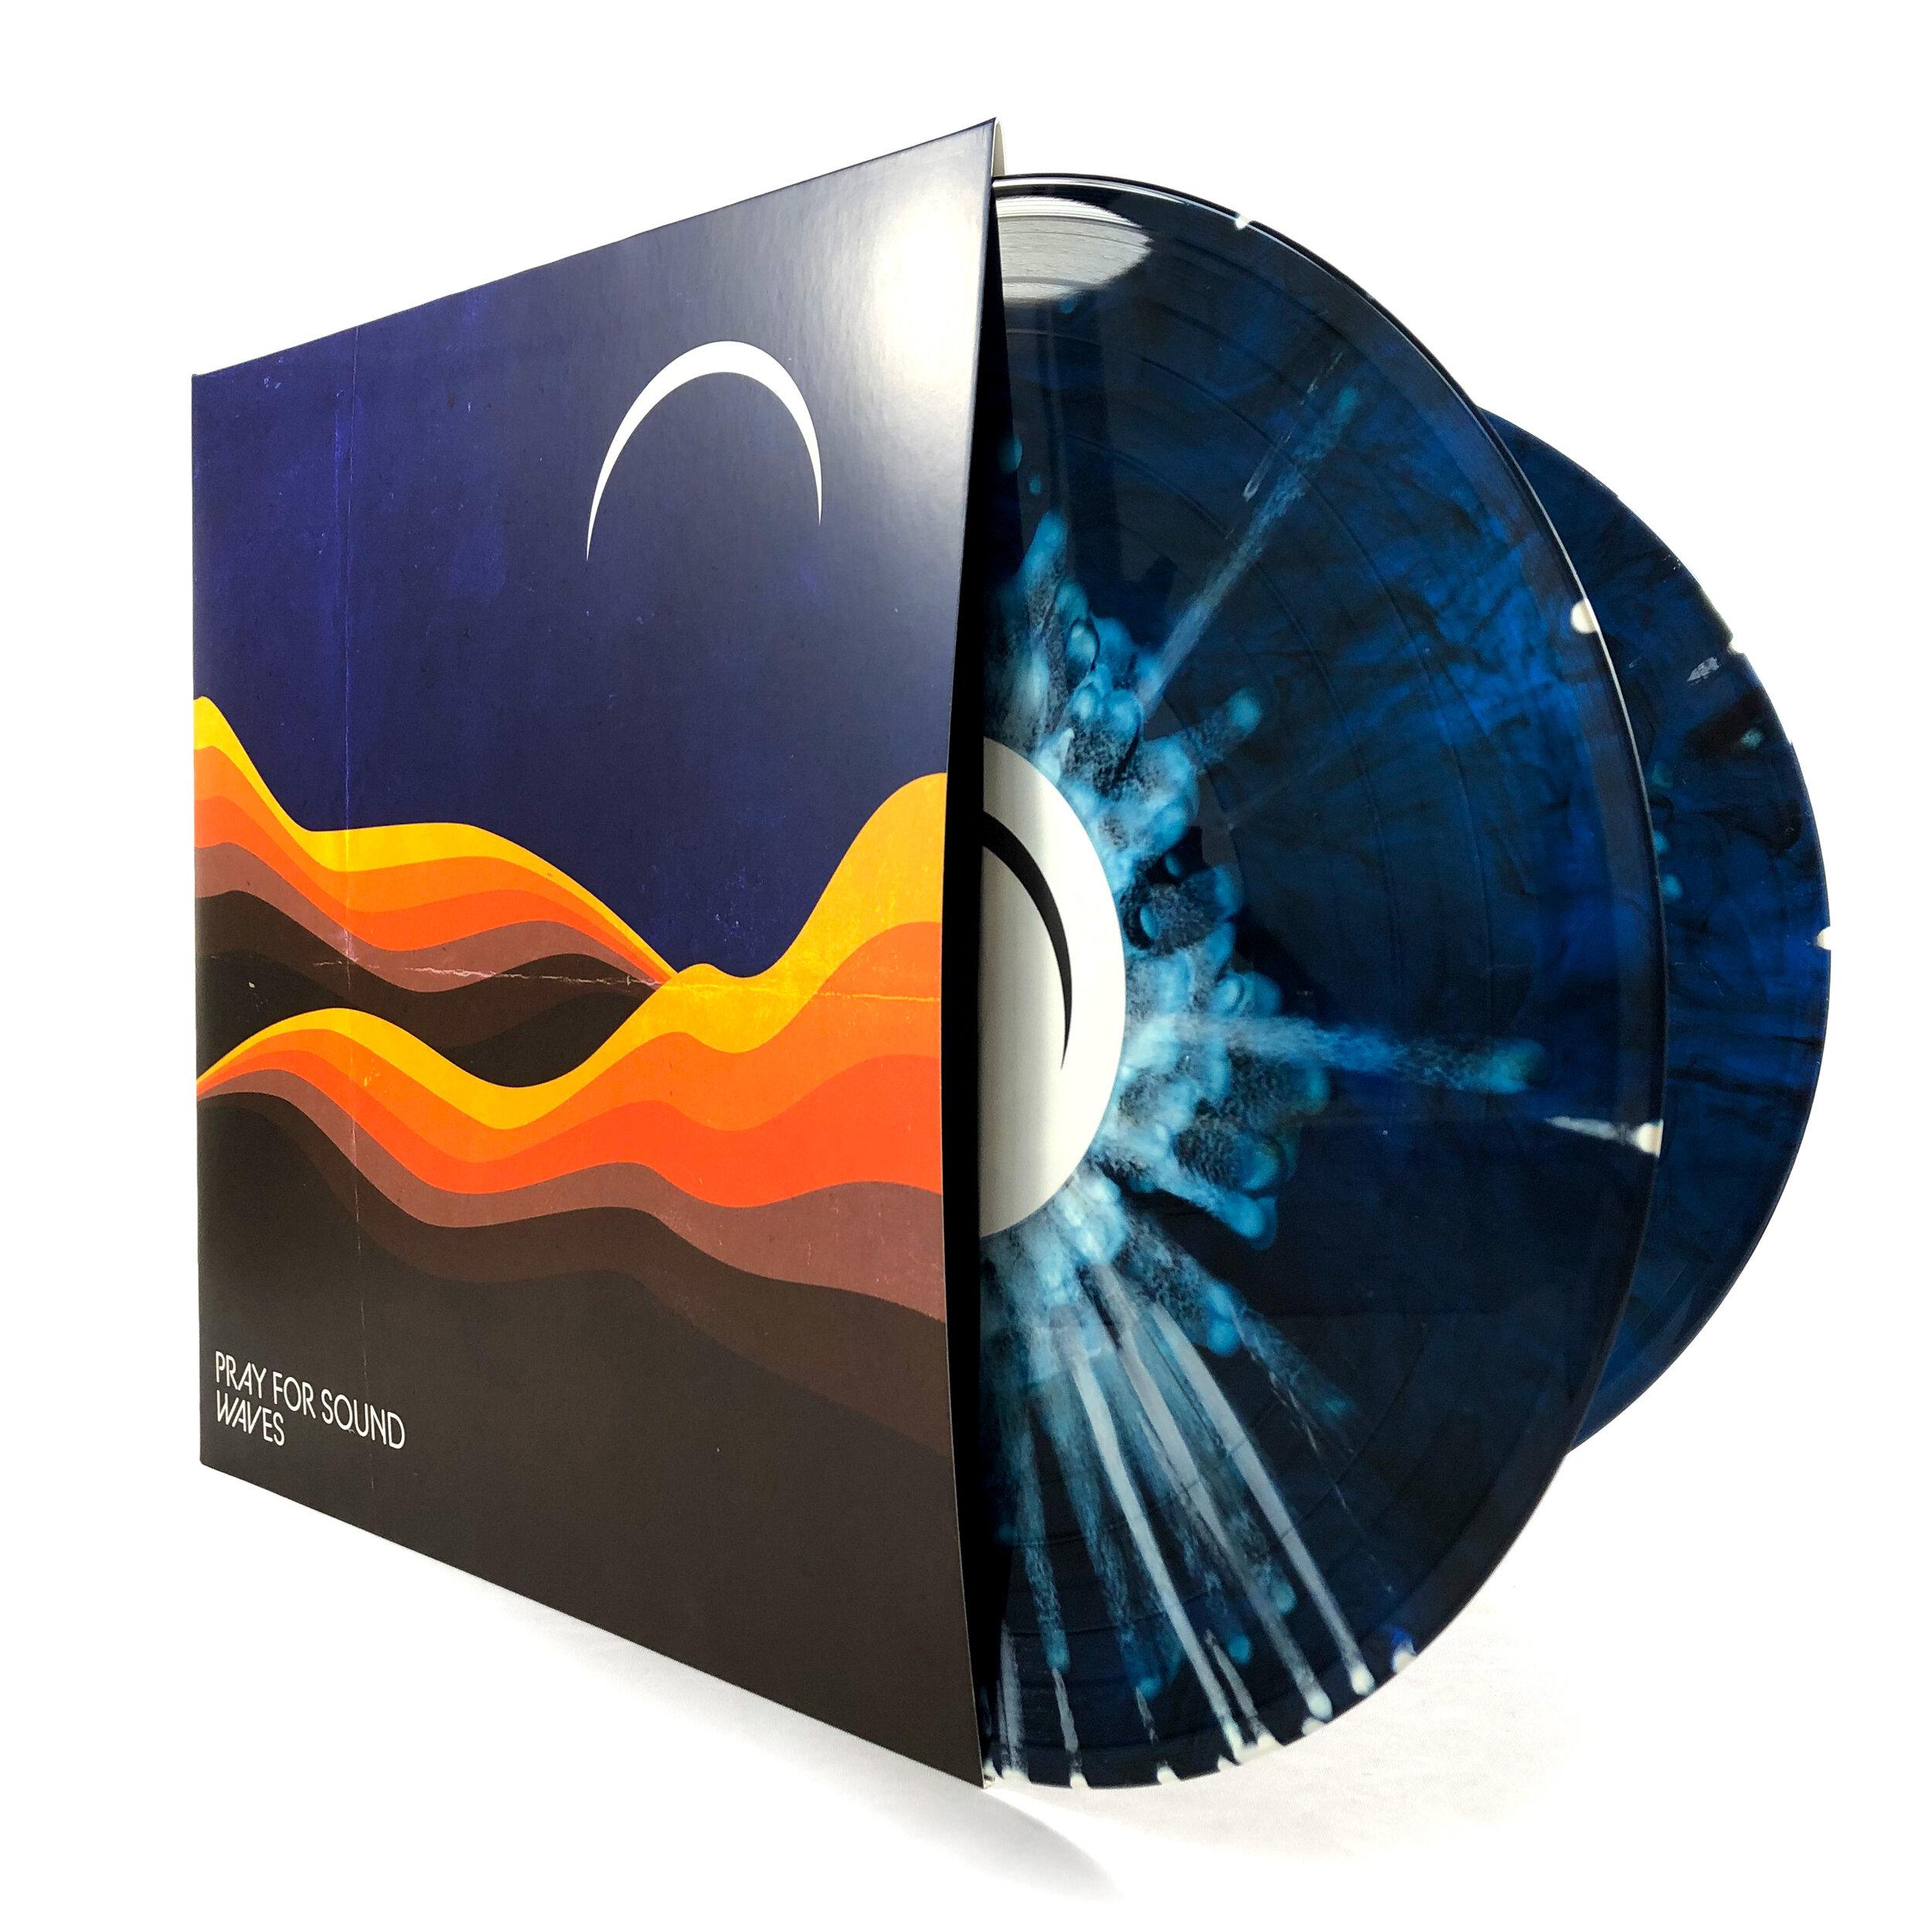 Pray For Sound • Waves [2xLP] - Double colored 180g vinyl Transparent Blue/Black Marble w/ White Splatter